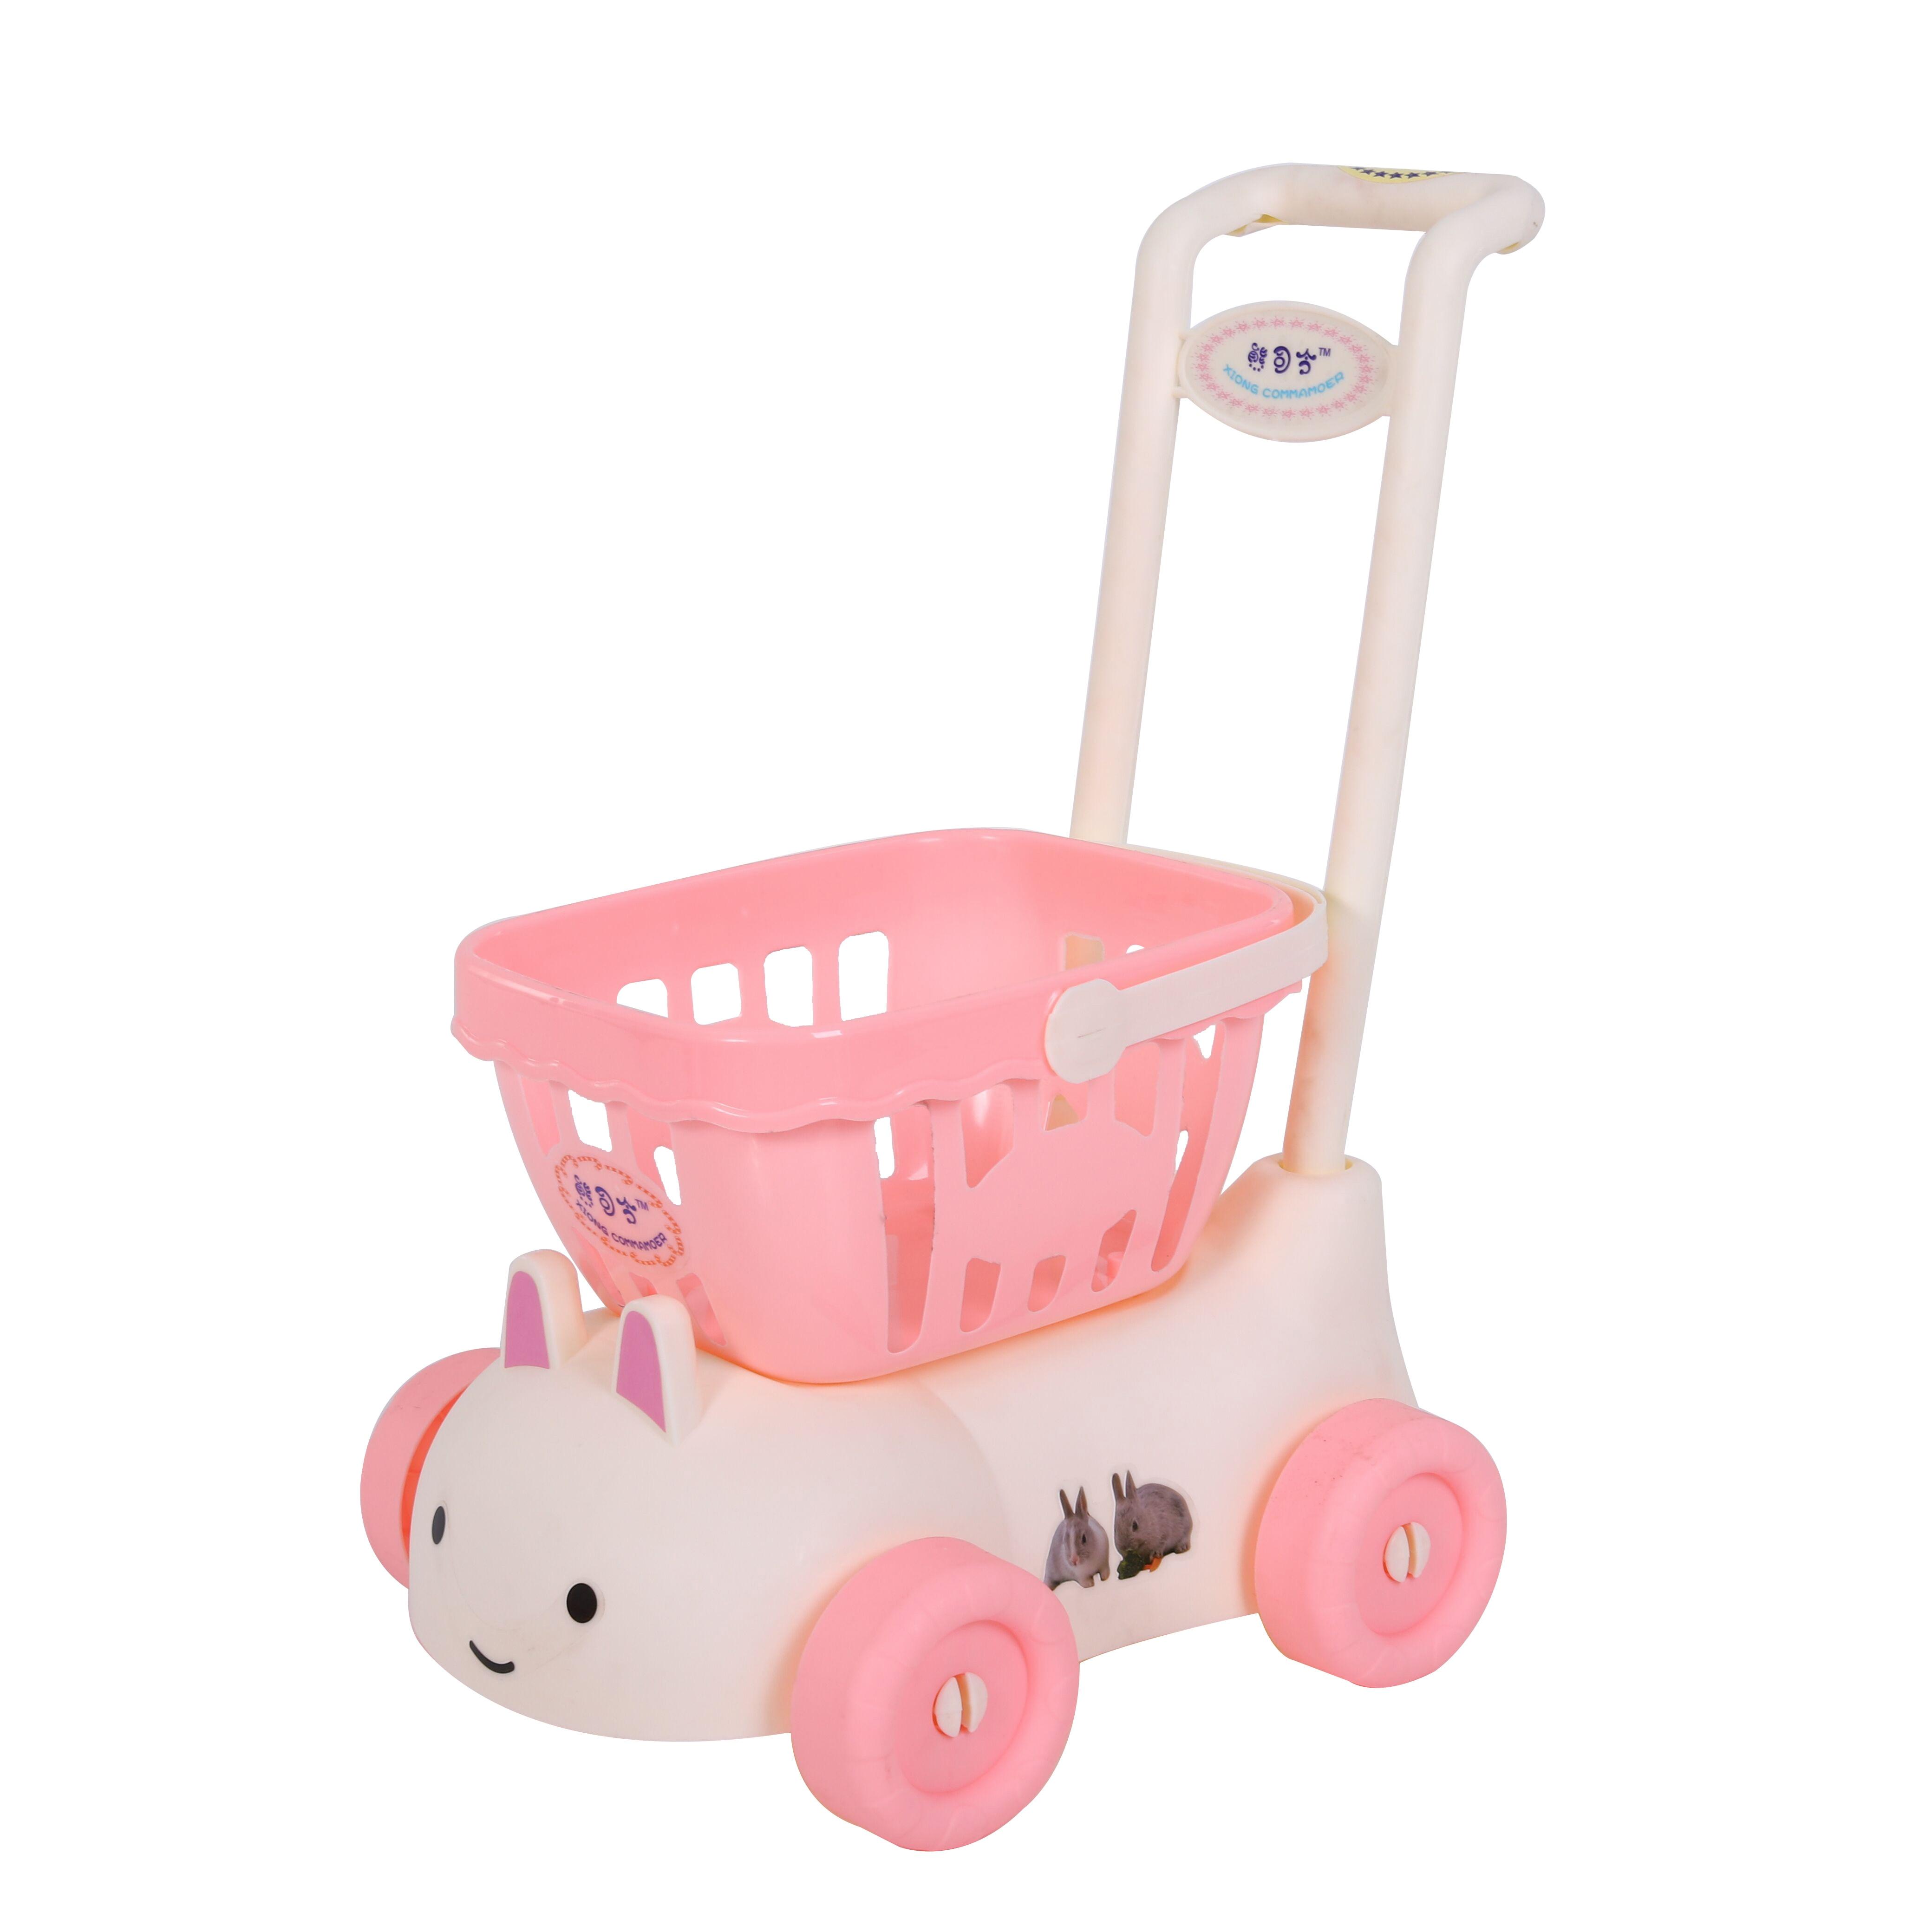 baby walker  for brithsday gift  baby stroller 3 in 1 start work use  shopping cart walker